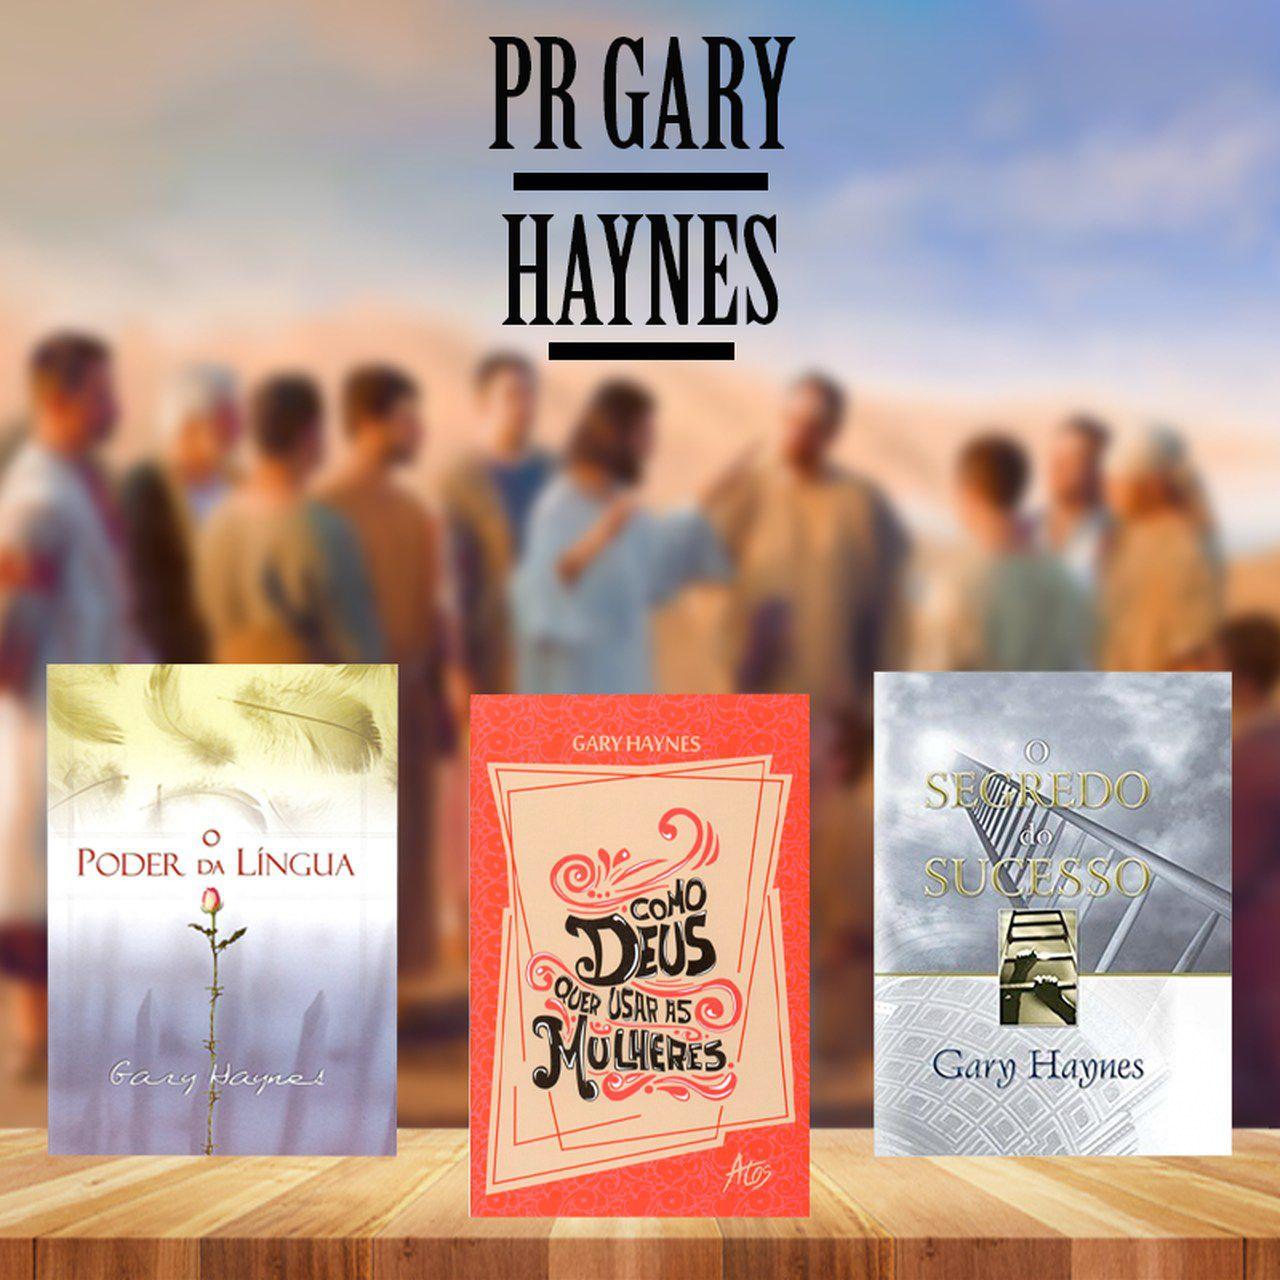 PR GARY HAYNES